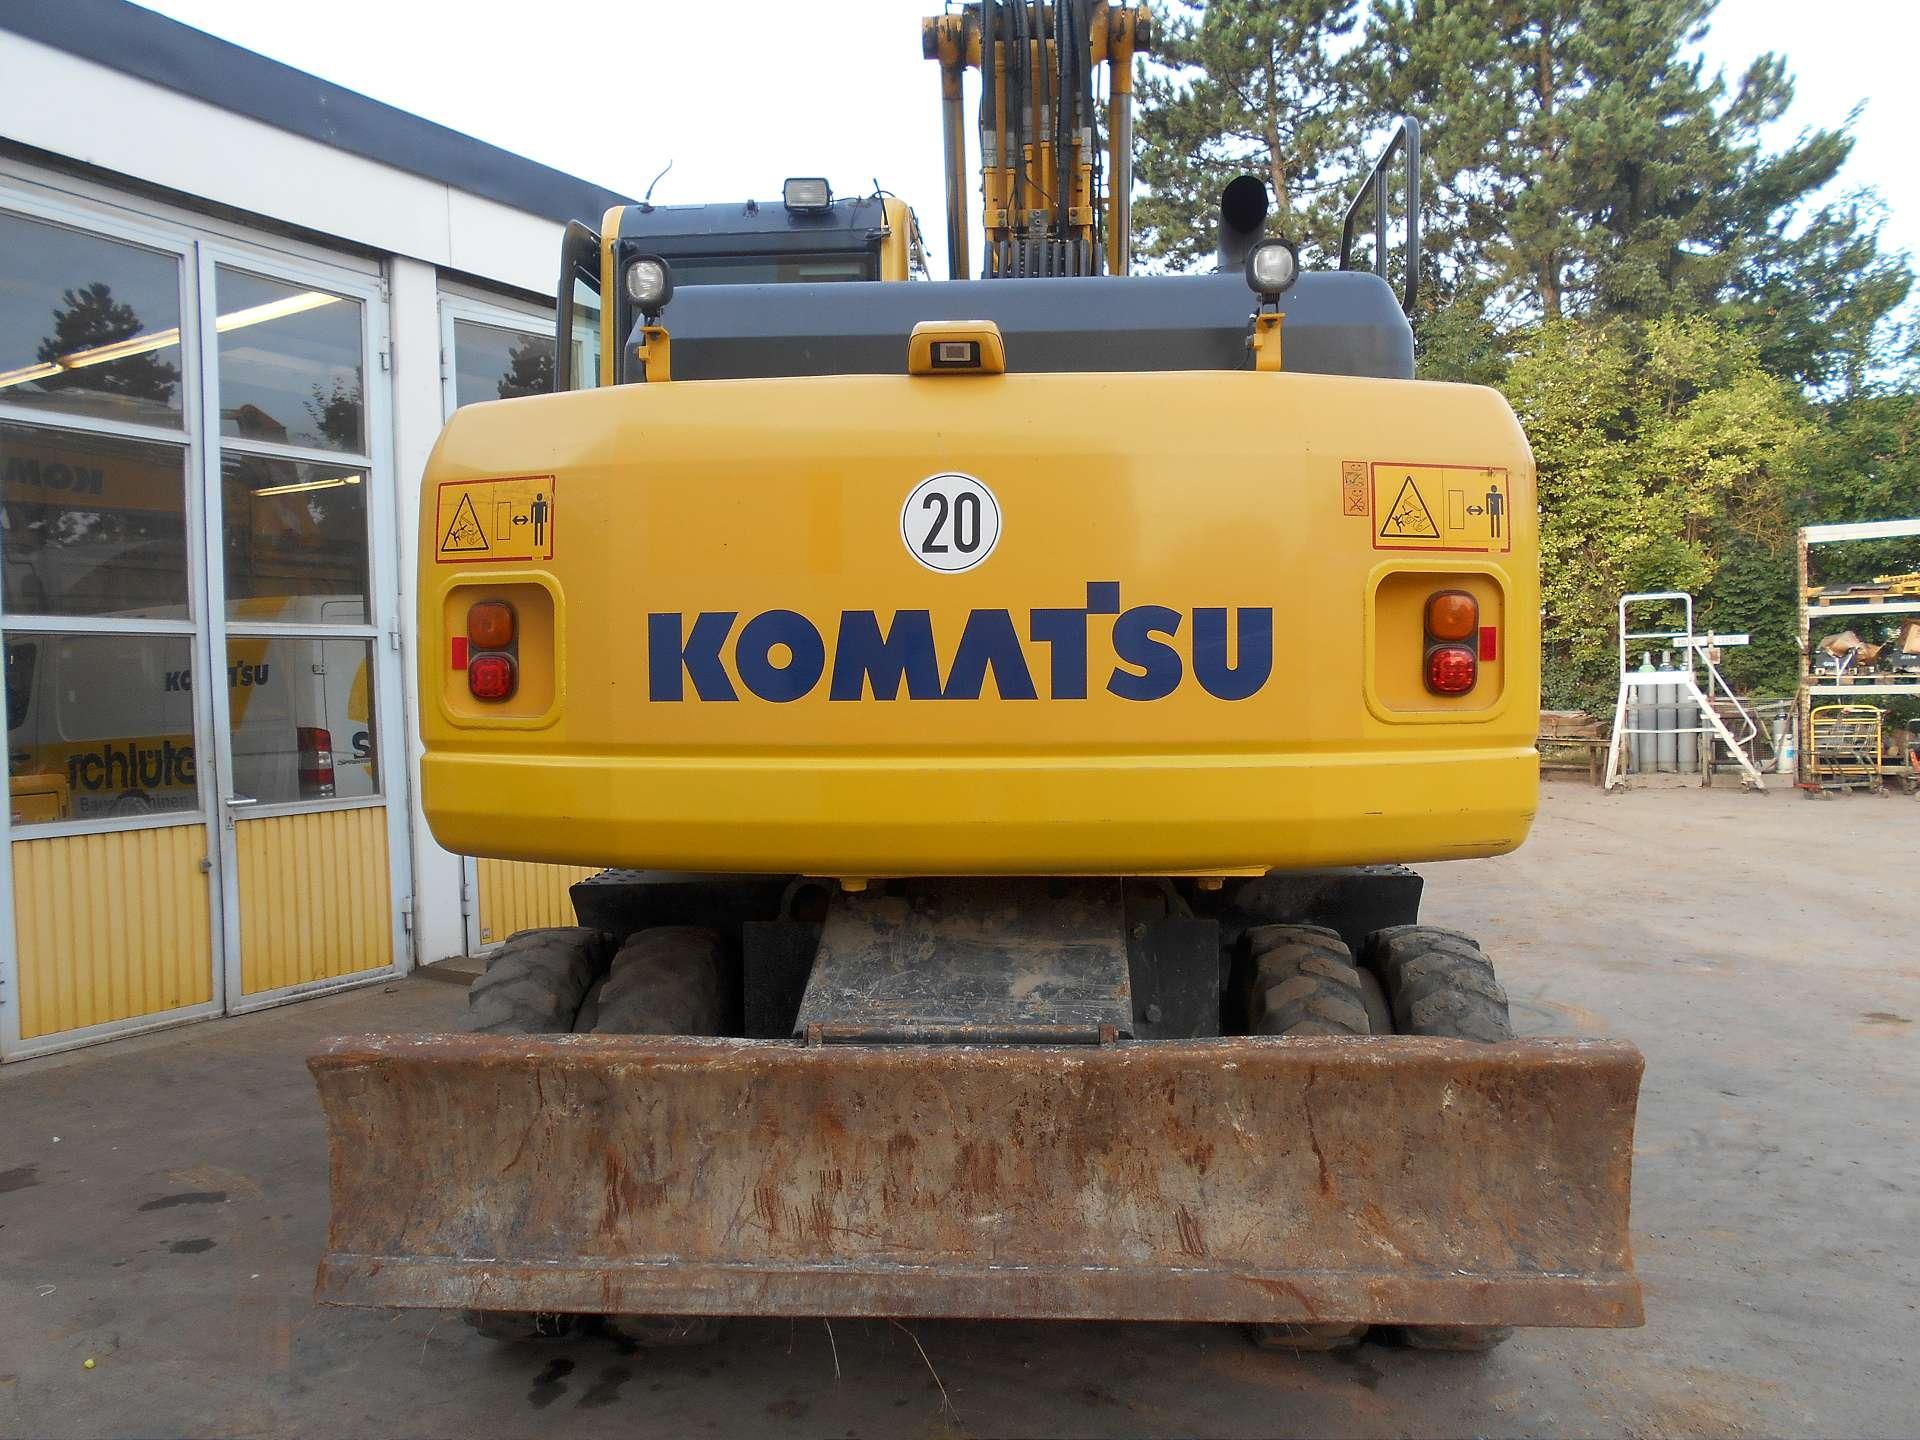 KOMATSU PW 160-8 - 08